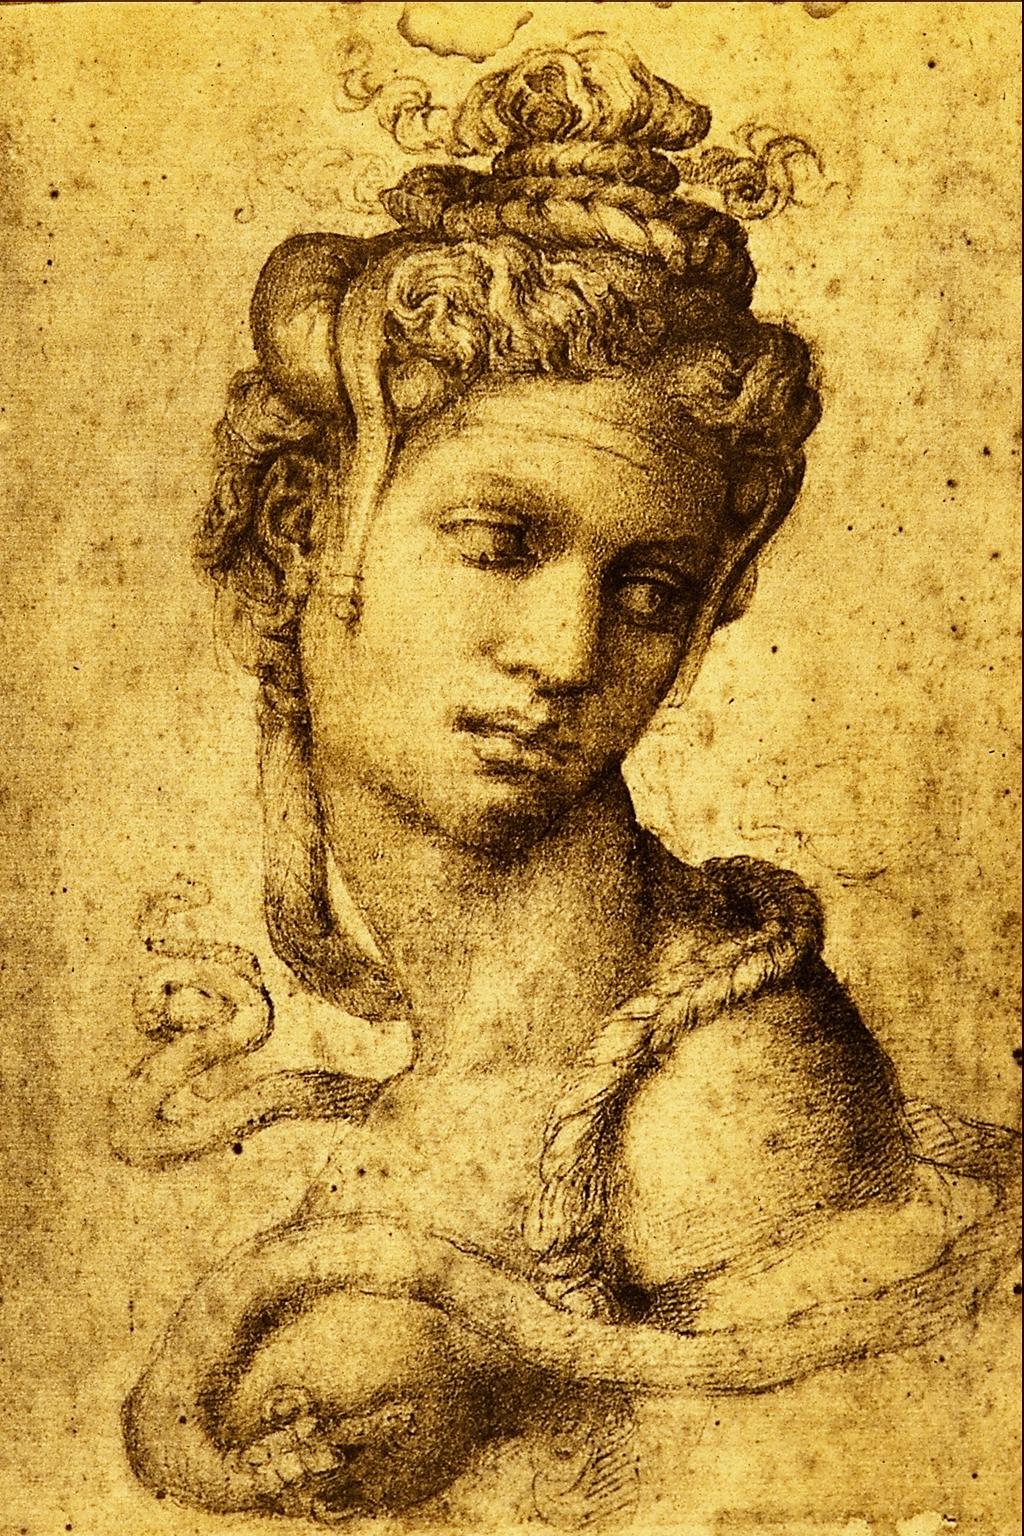 Cleopatra_-_Michelangelo_Buonarroti.png